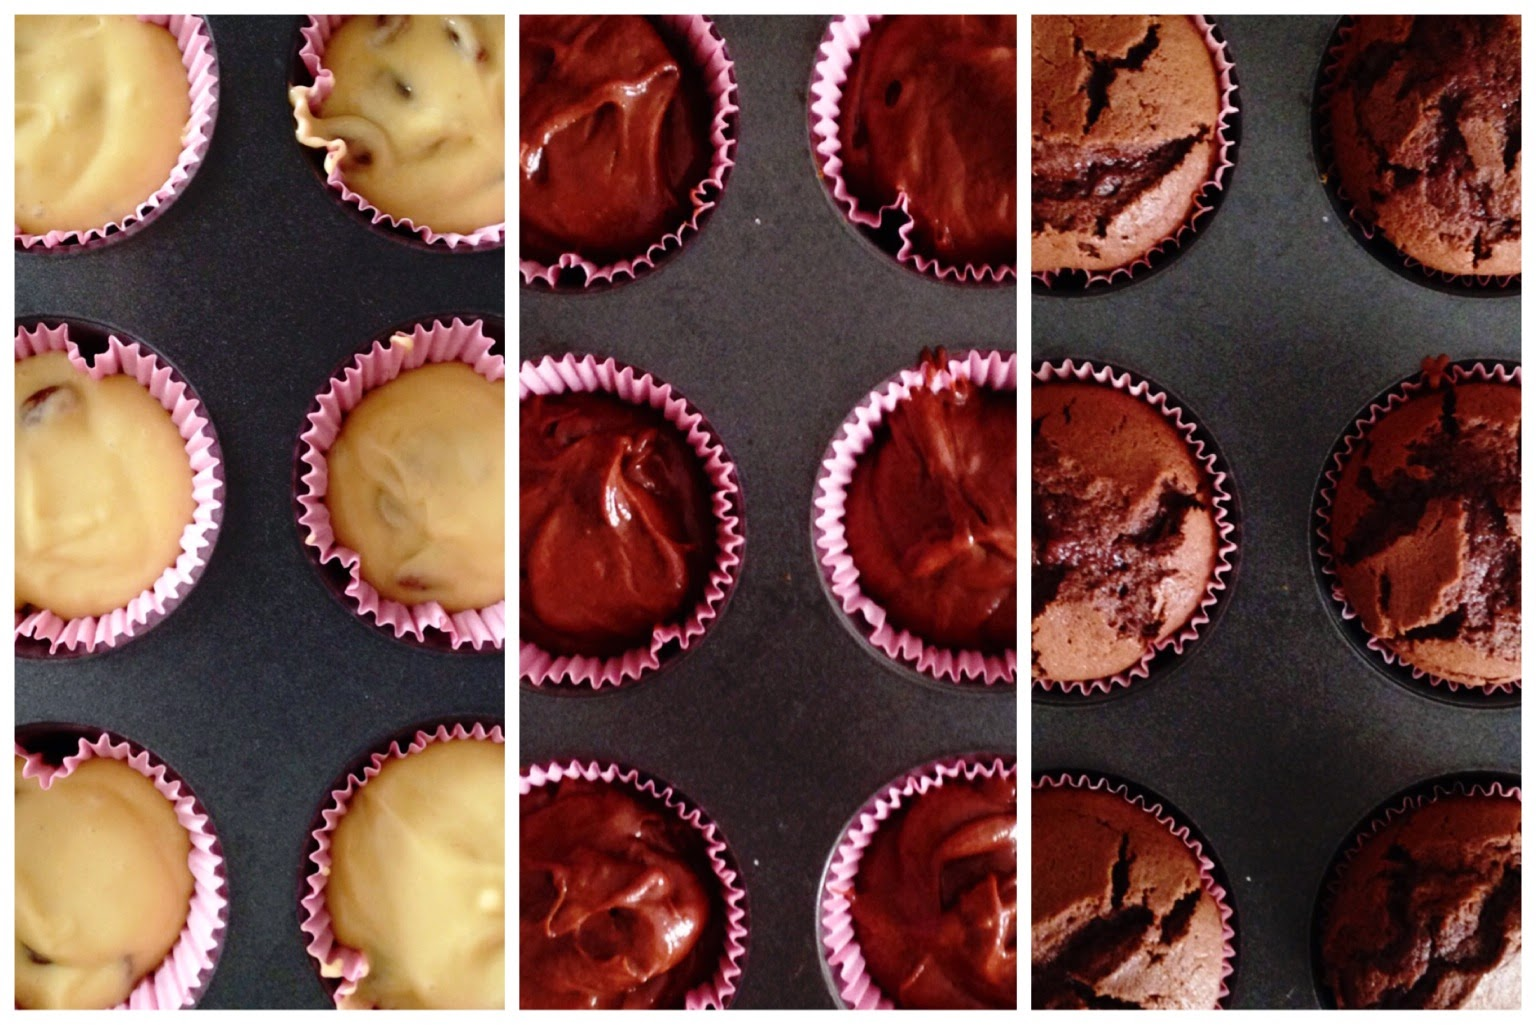 Cupcake Chloe.S Paris Homemade Fait Maison